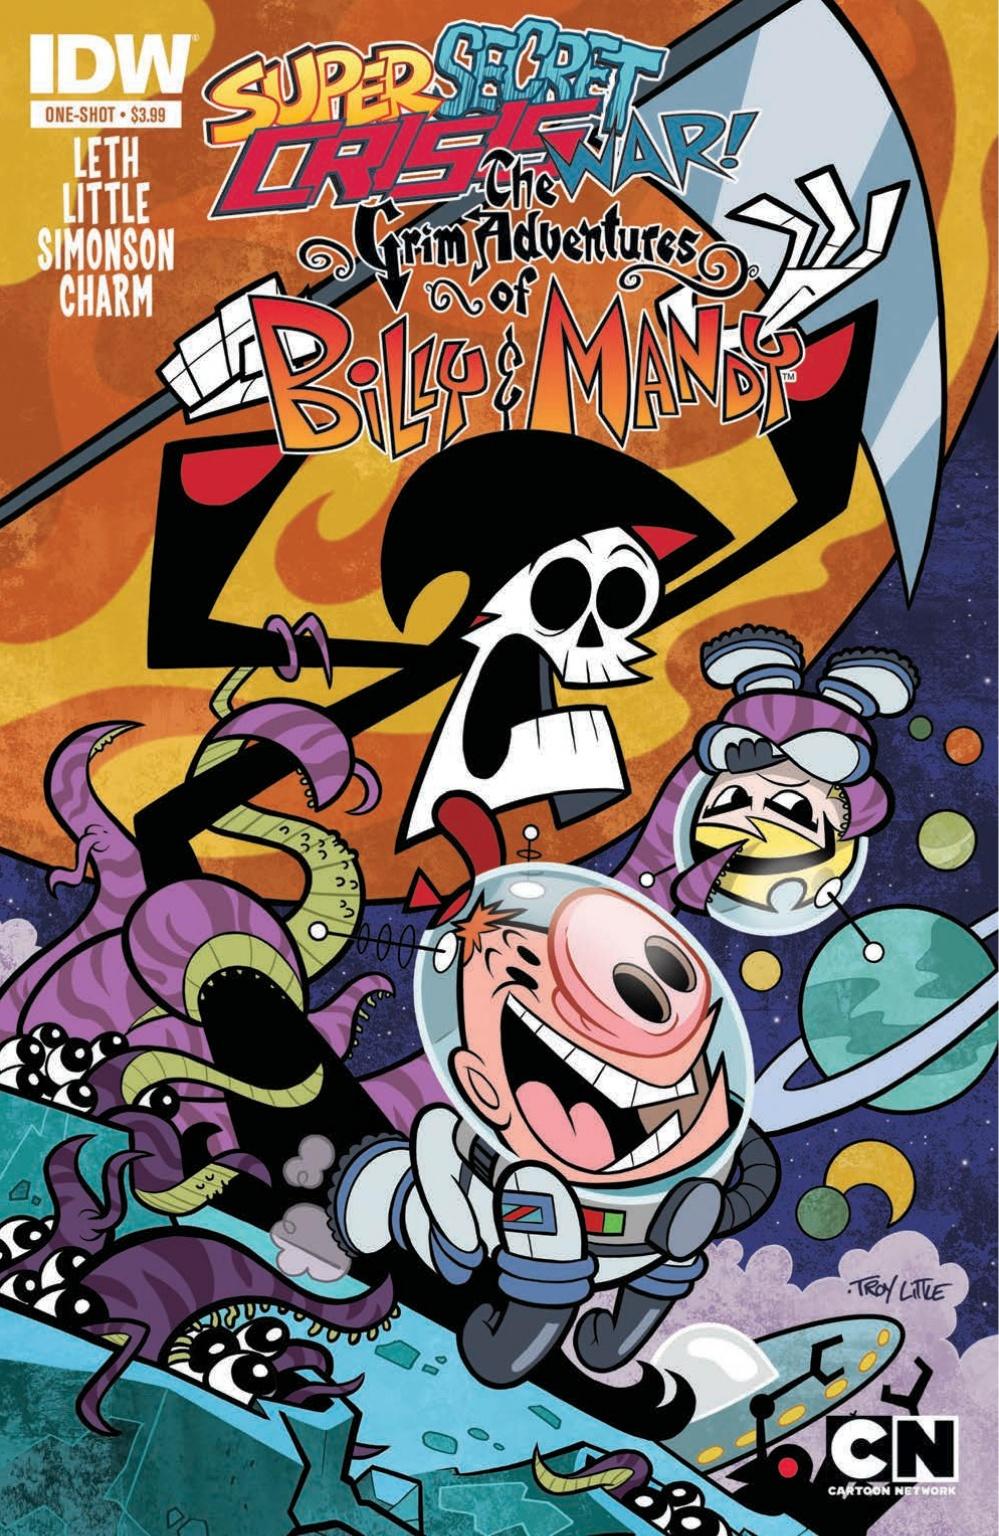 <eM>Super Secret Crisis War: The Grim Adventures of Billy and Mandy</em> #1